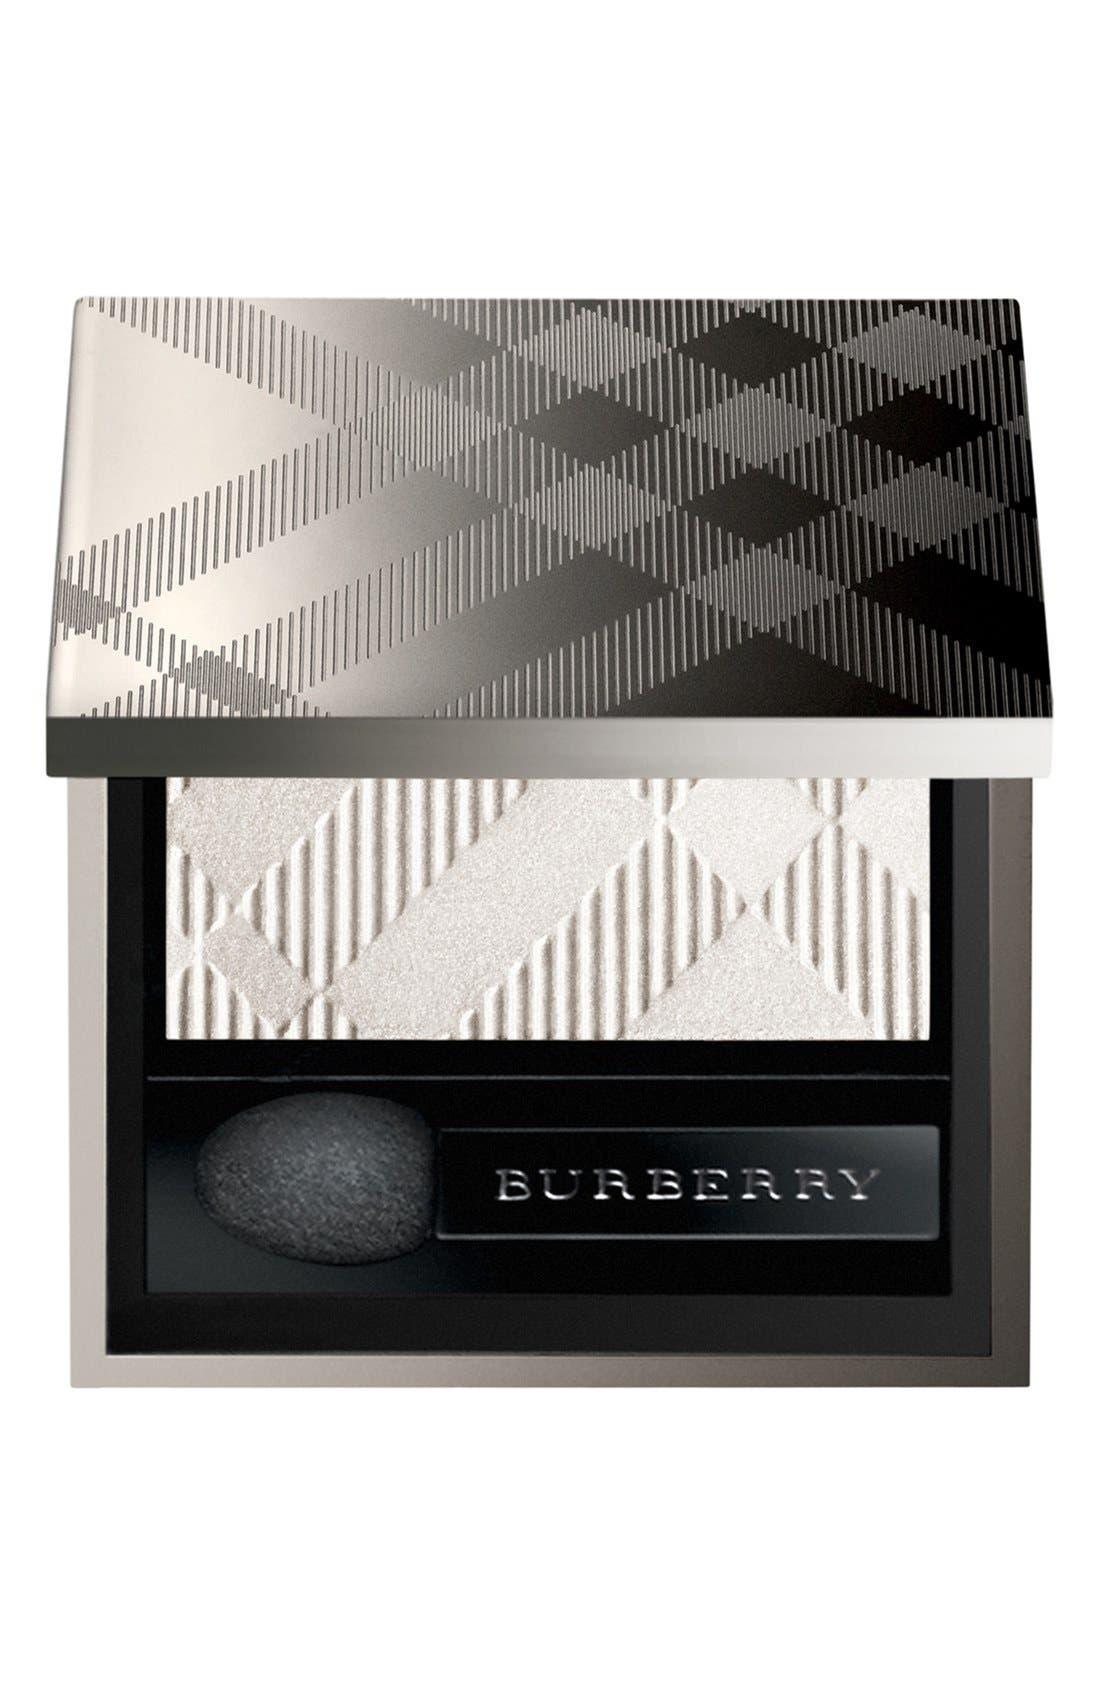 BURBERRY BEAUTY, Eye Colour - Wet & Dry Glow Eyeshadow, Main thumbnail 1, color, 100